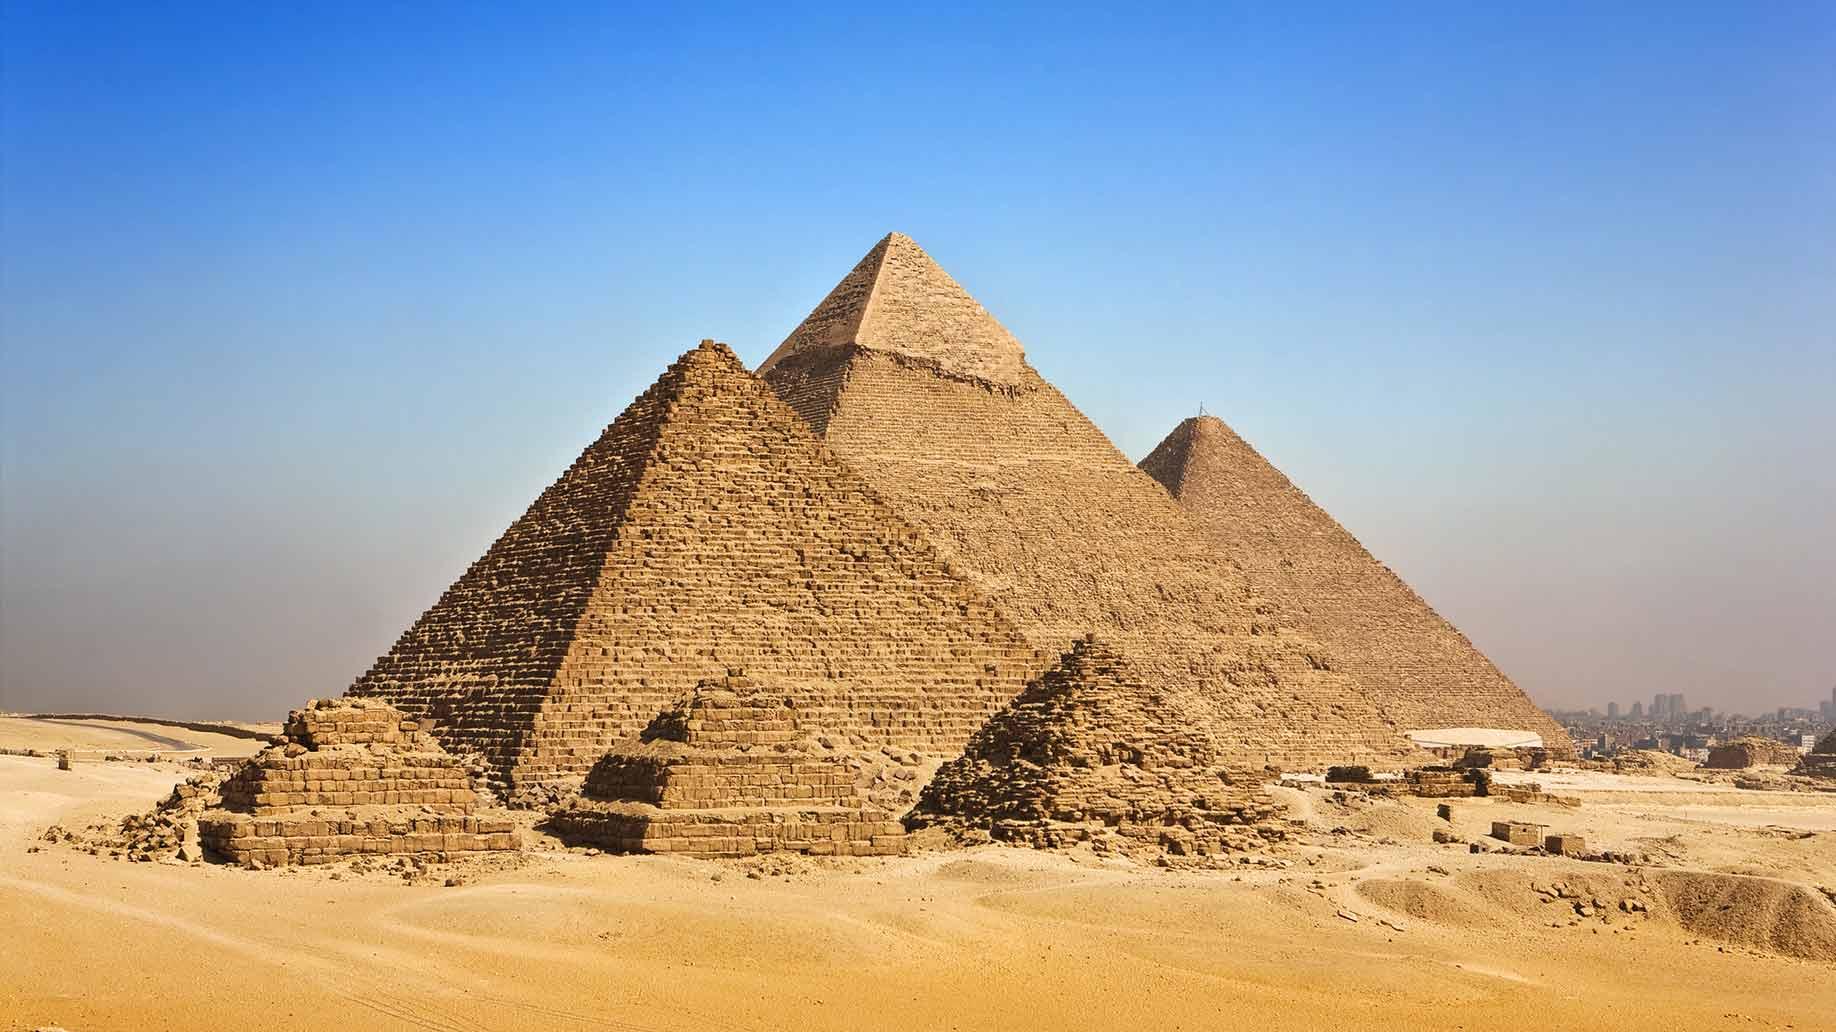 FSOE 500: Armin van Buuren And Aly & Fila At Great Pyramids